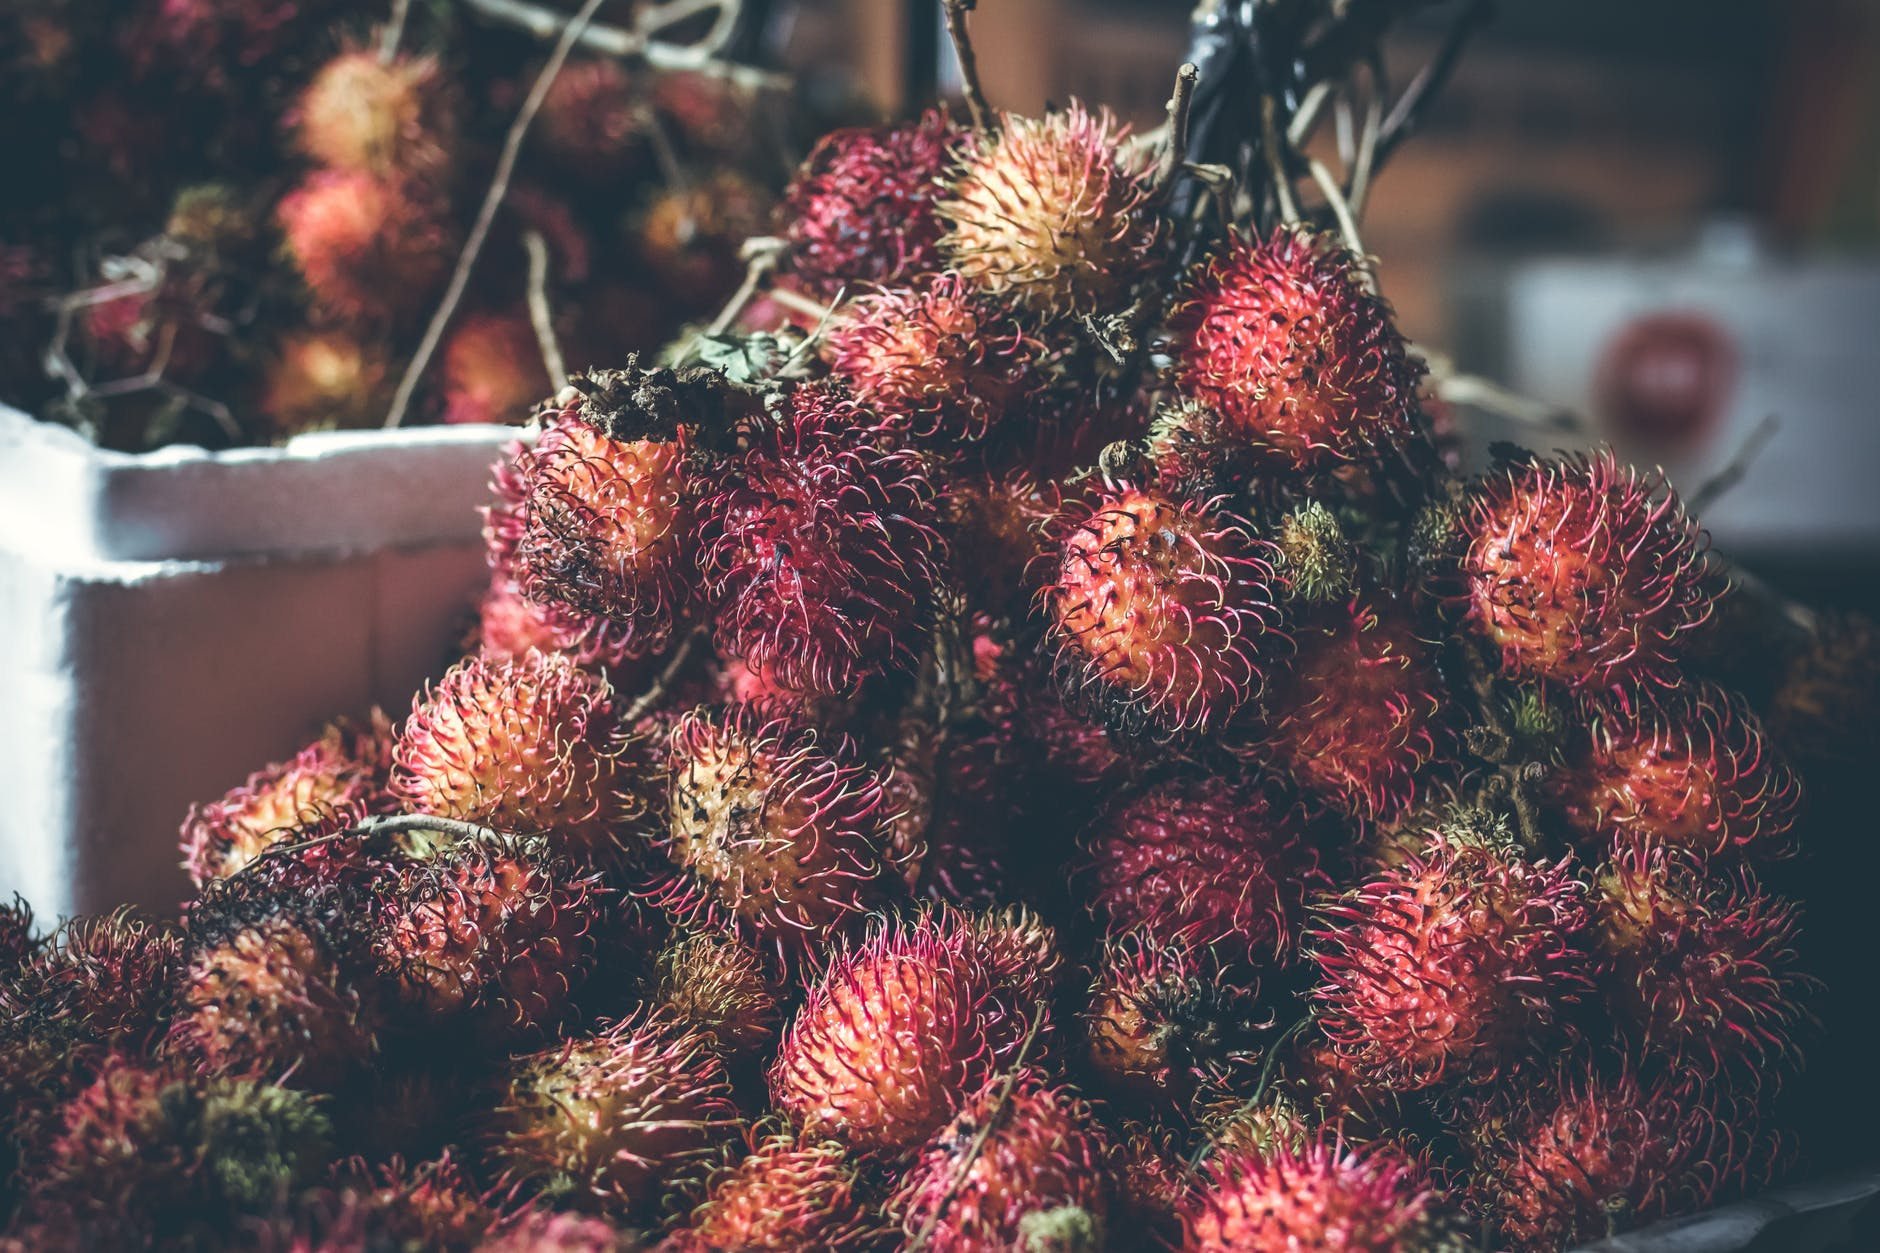 Rambután fruto